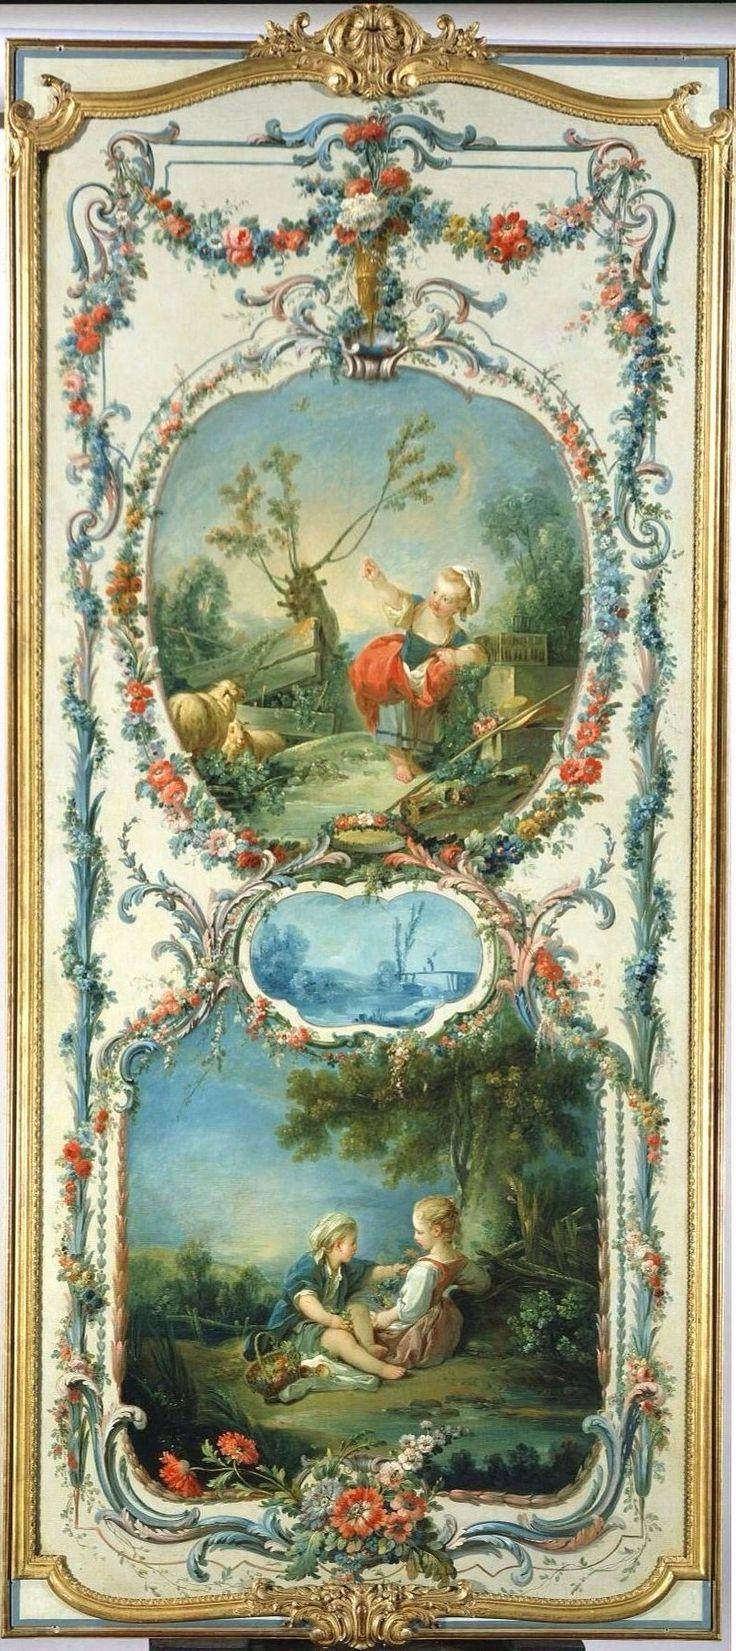 François Boucher  (1703 - 1770)   The Arts and Sciences: Fowling and Horticulture, 1750-1752  oil on canvas  Madame de Pompadour, Château de Crécy  The Frick Collection  #Boucher .